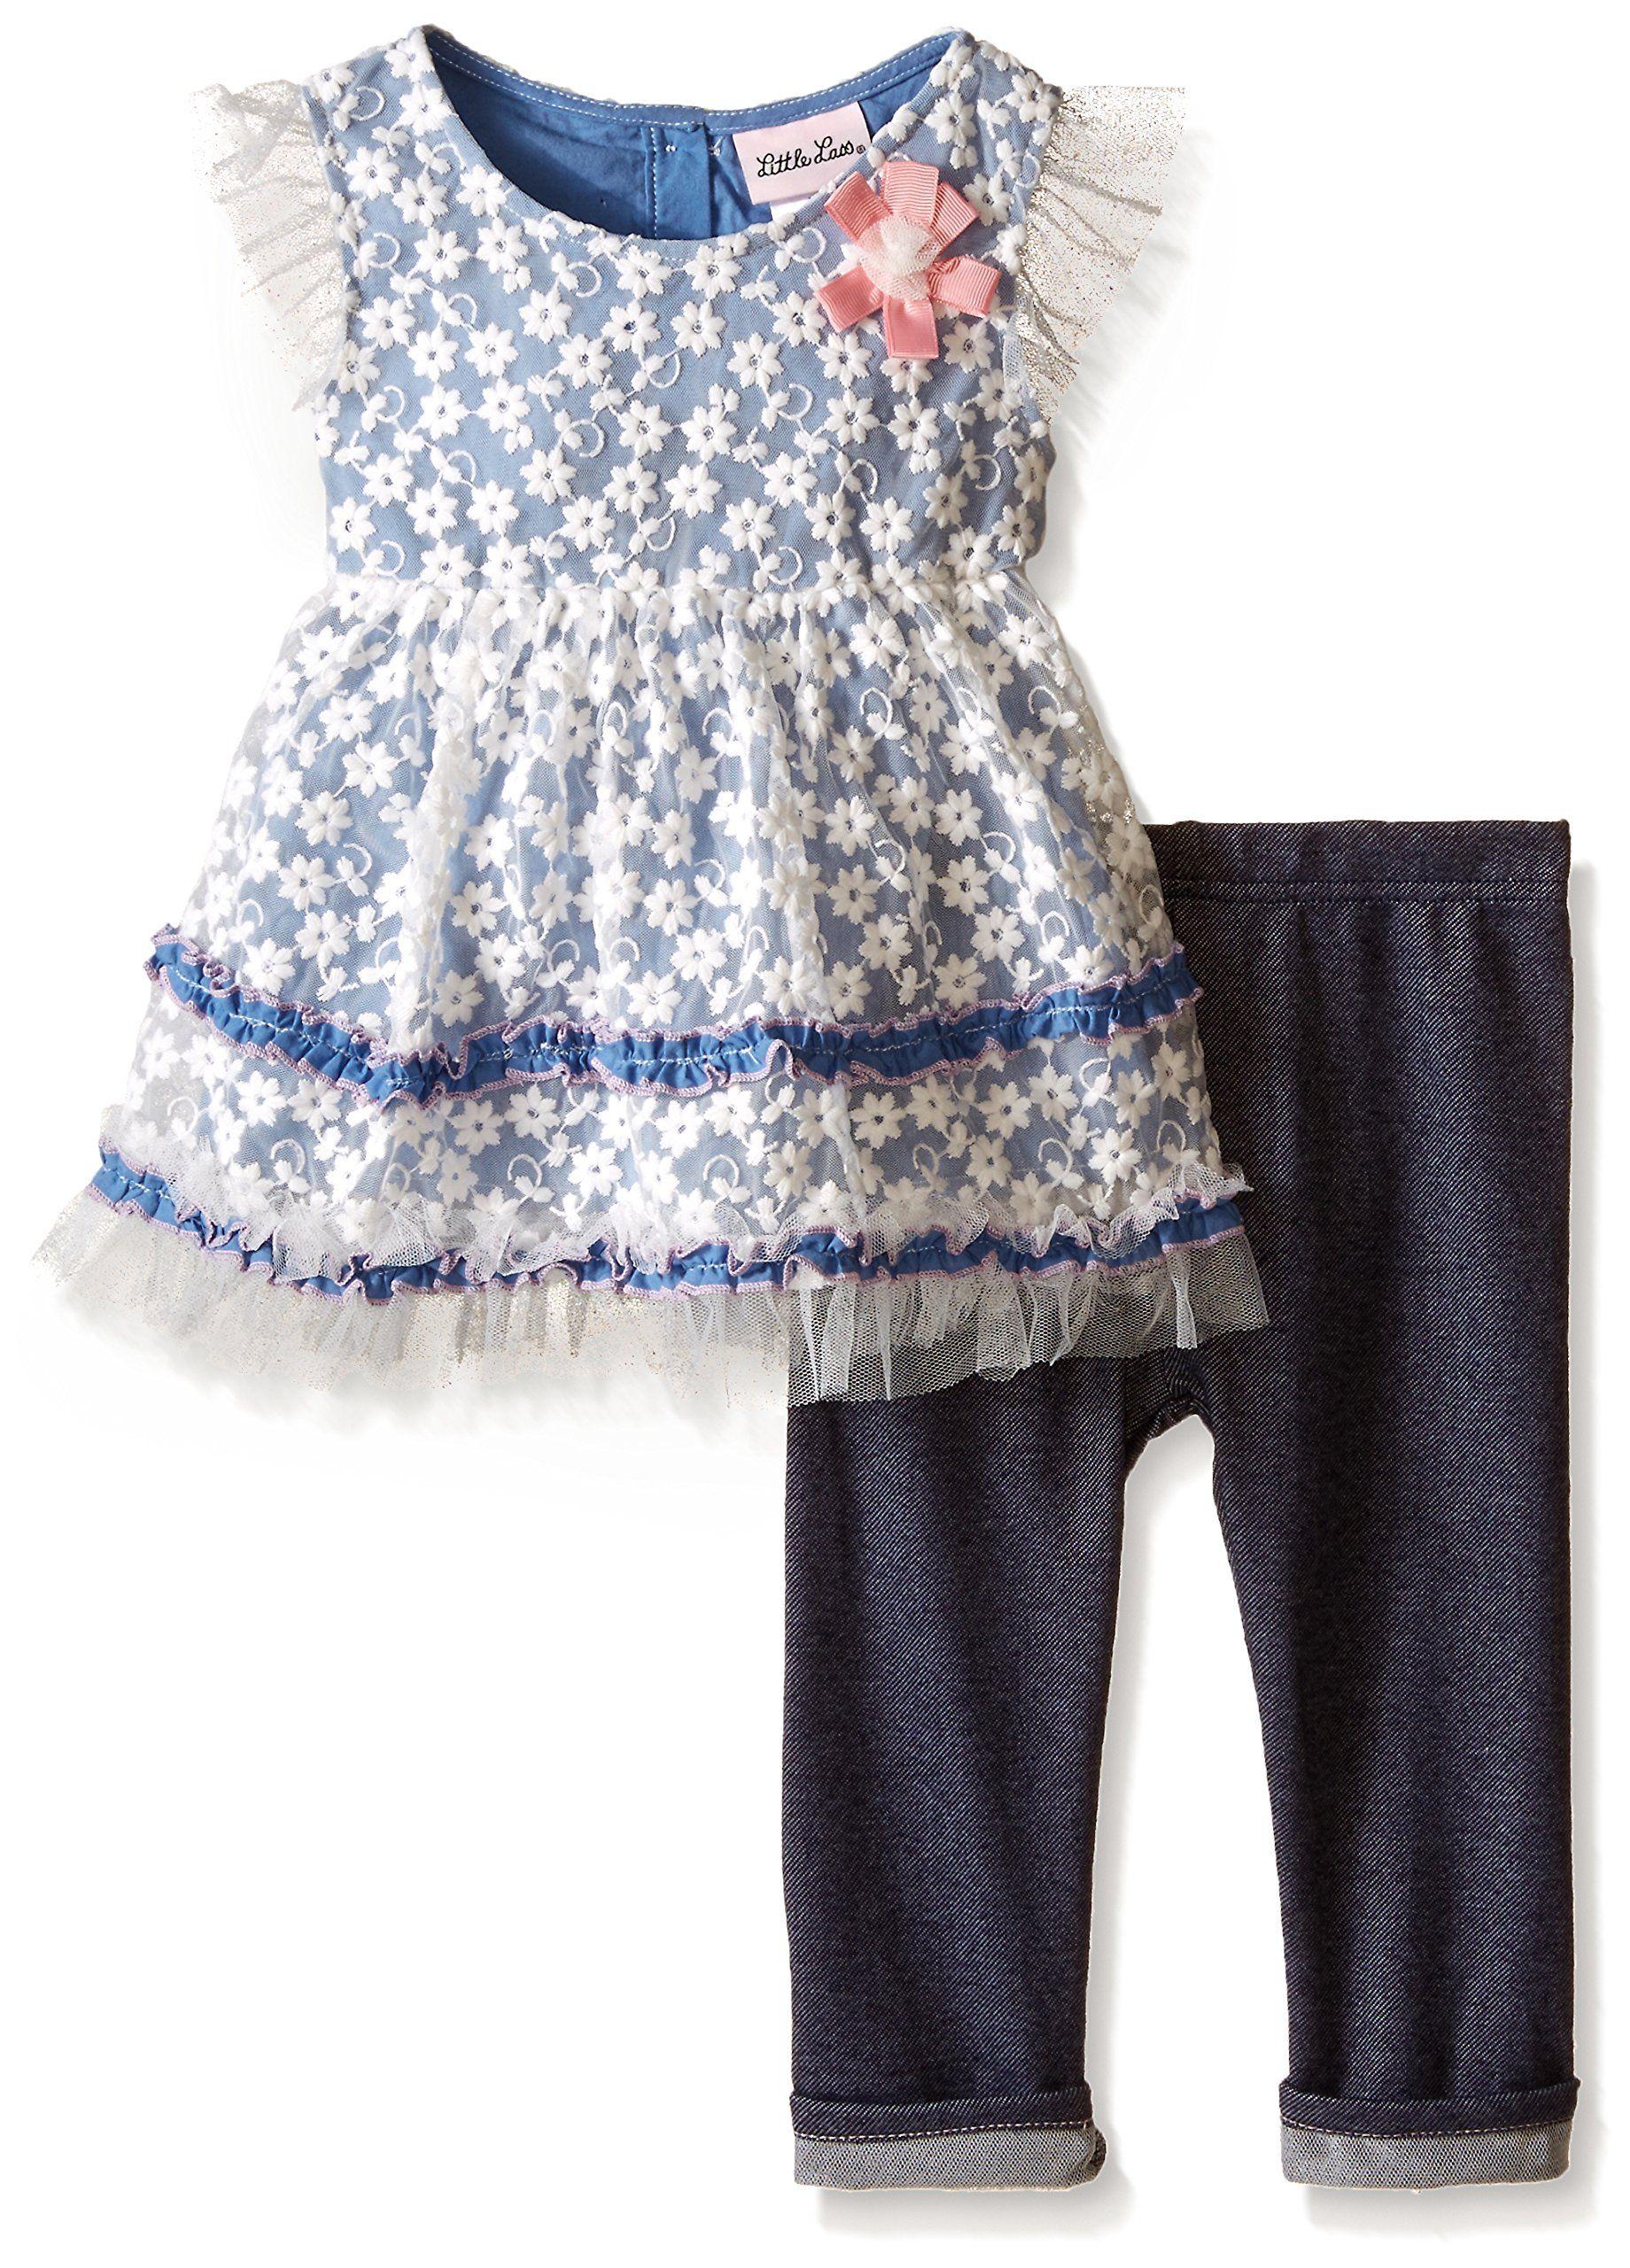 b5e328db2c496 Little Lass Baby Girls  2 Pc Capri Set Embroidered Lace